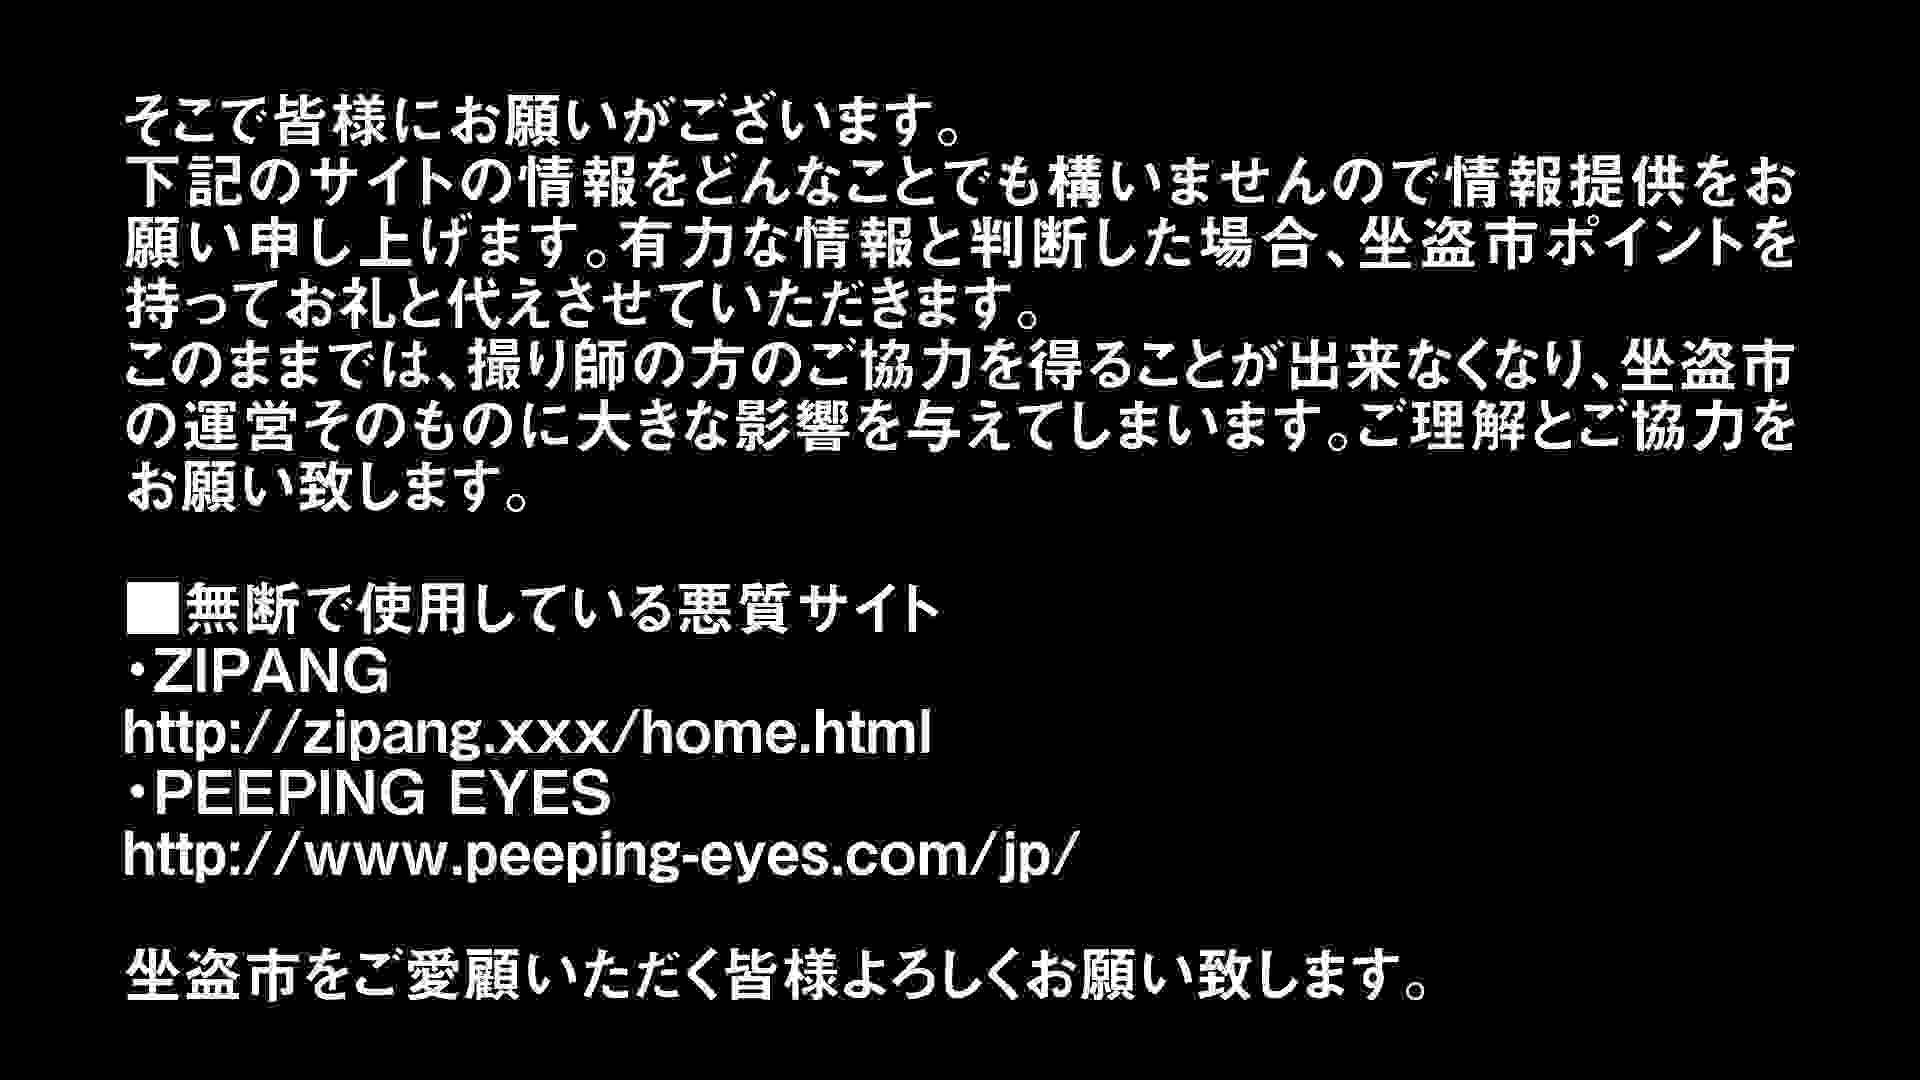 Aquaな露天風呂Vol.294 OLセックス  75画像 36